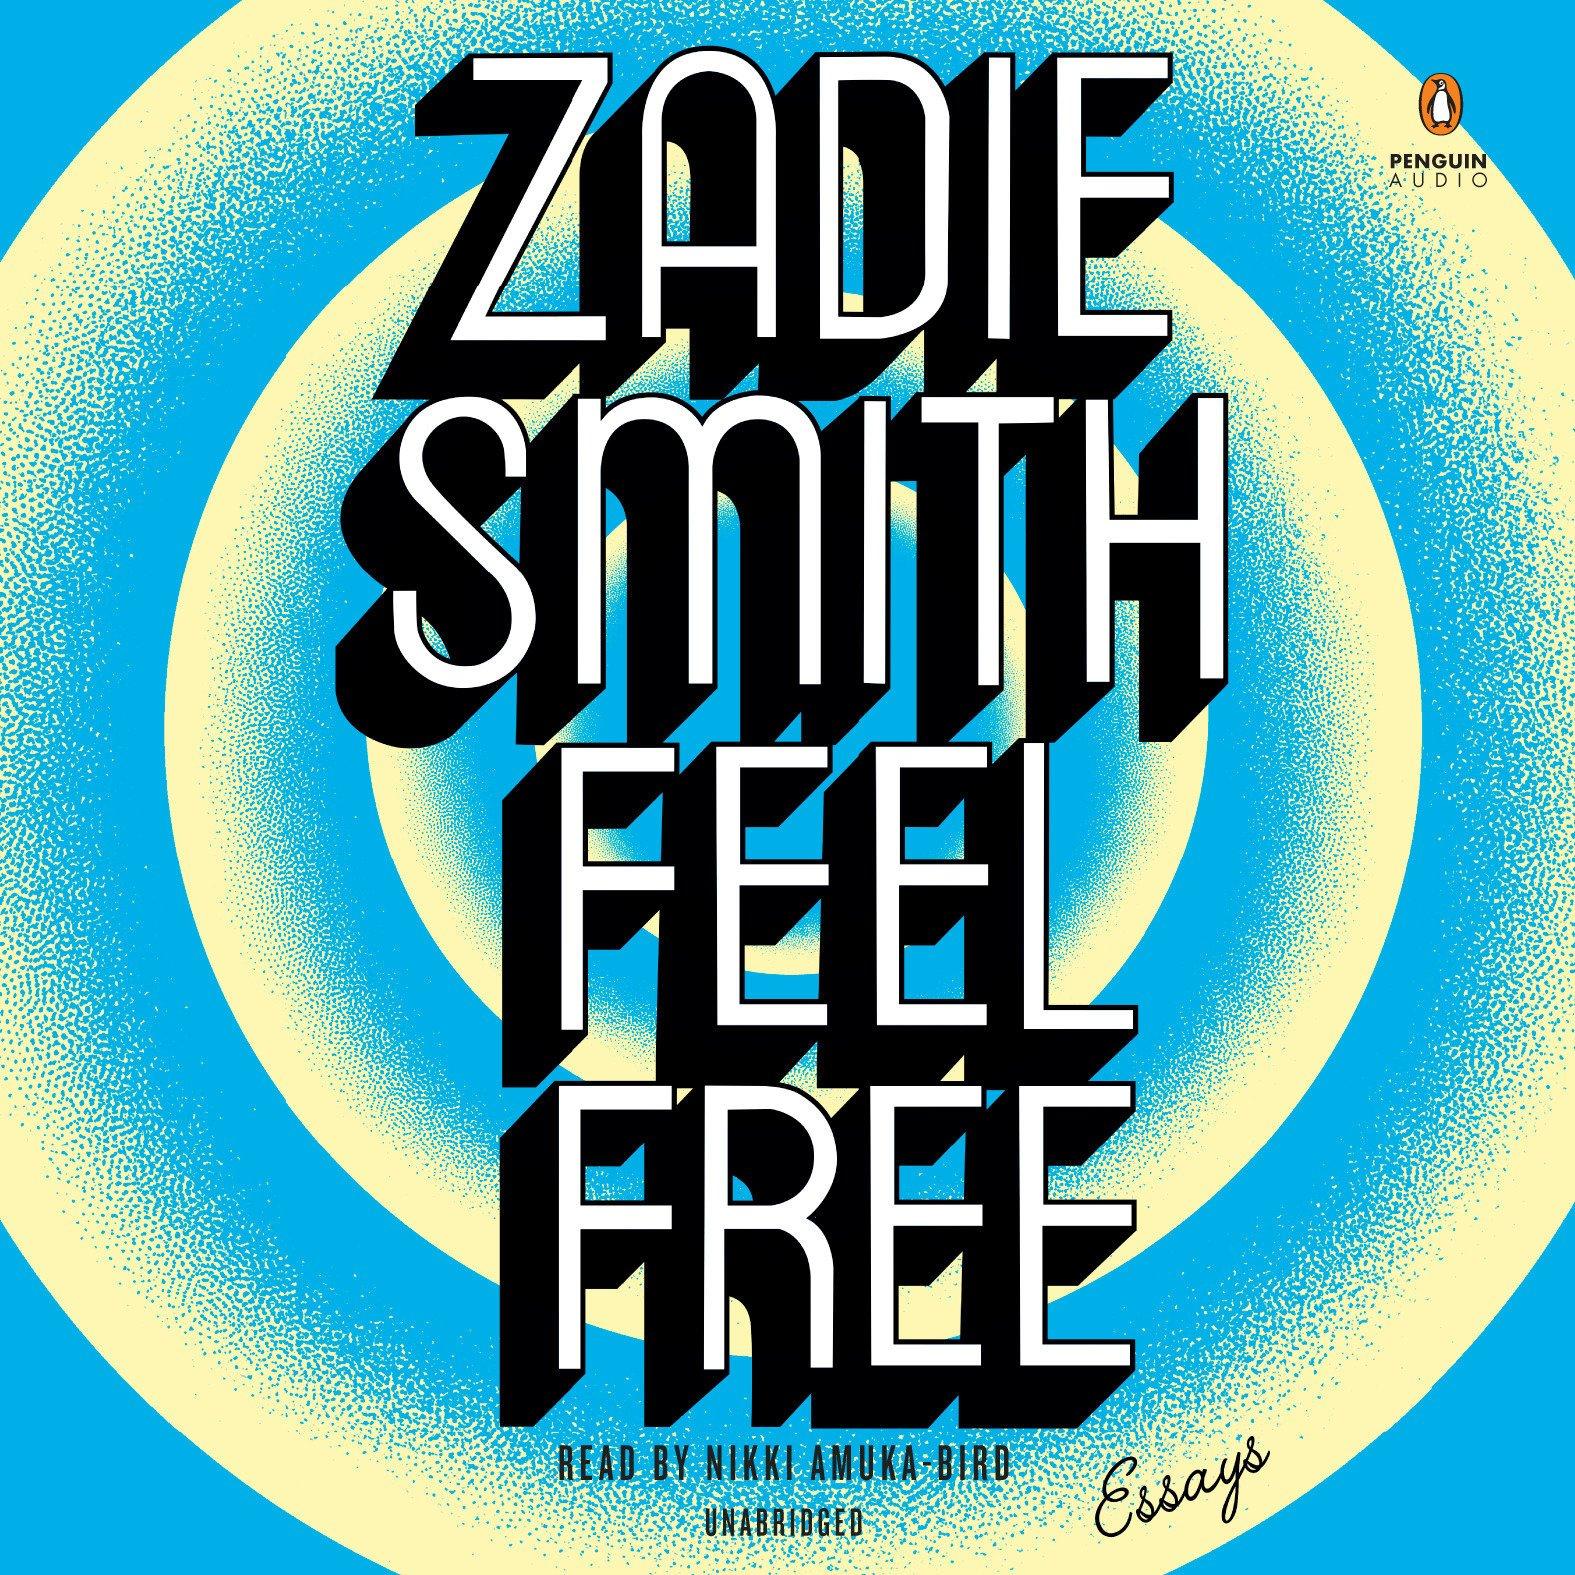 Feel Free: Essays: Amazon.es: Zadie Smith, Nikki Aumka-Bird ...